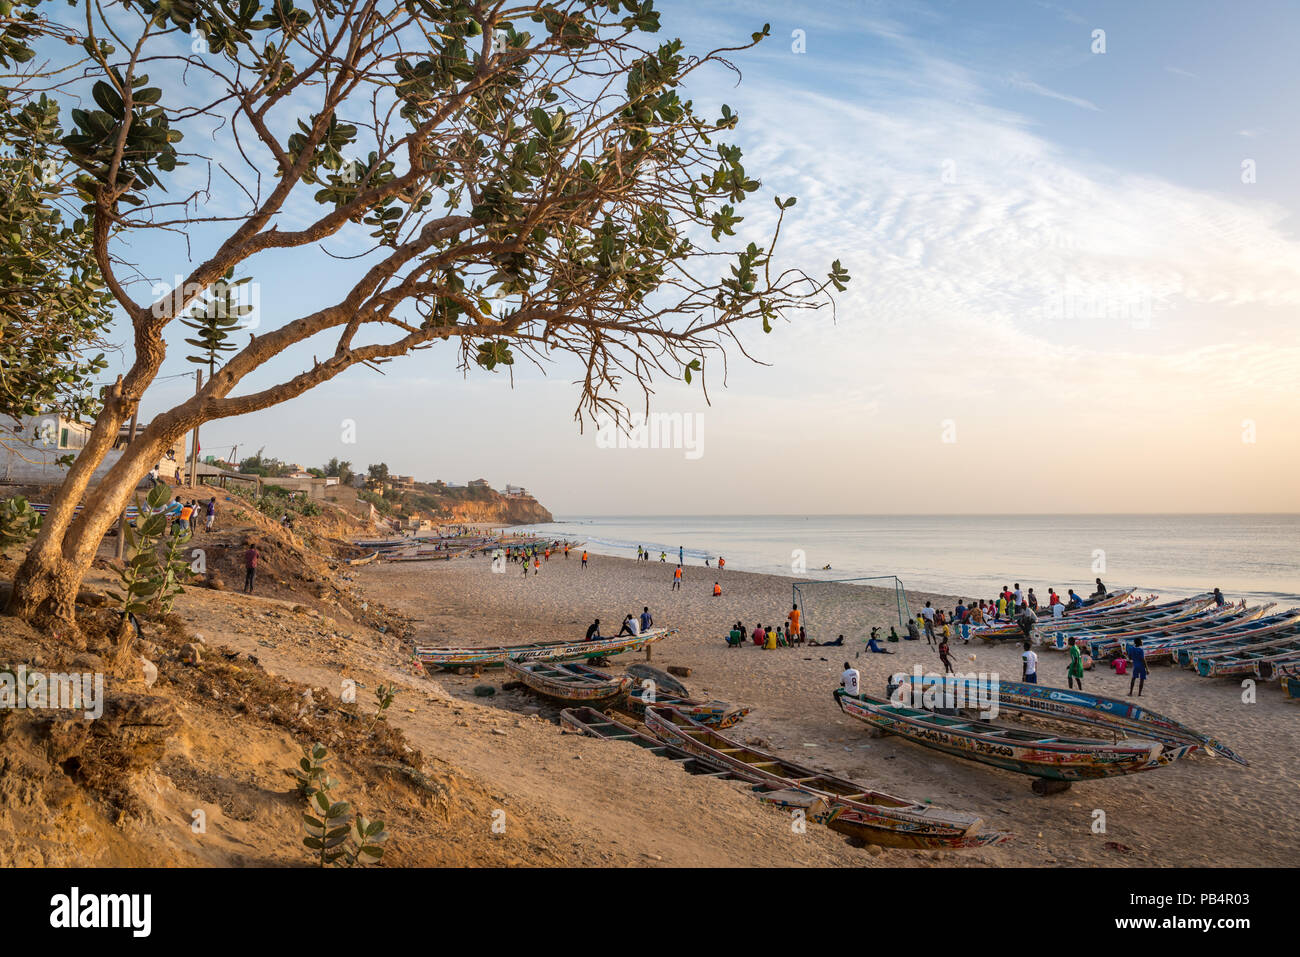 La playa de Toubab Dialao, Senegal Imagen De Stock